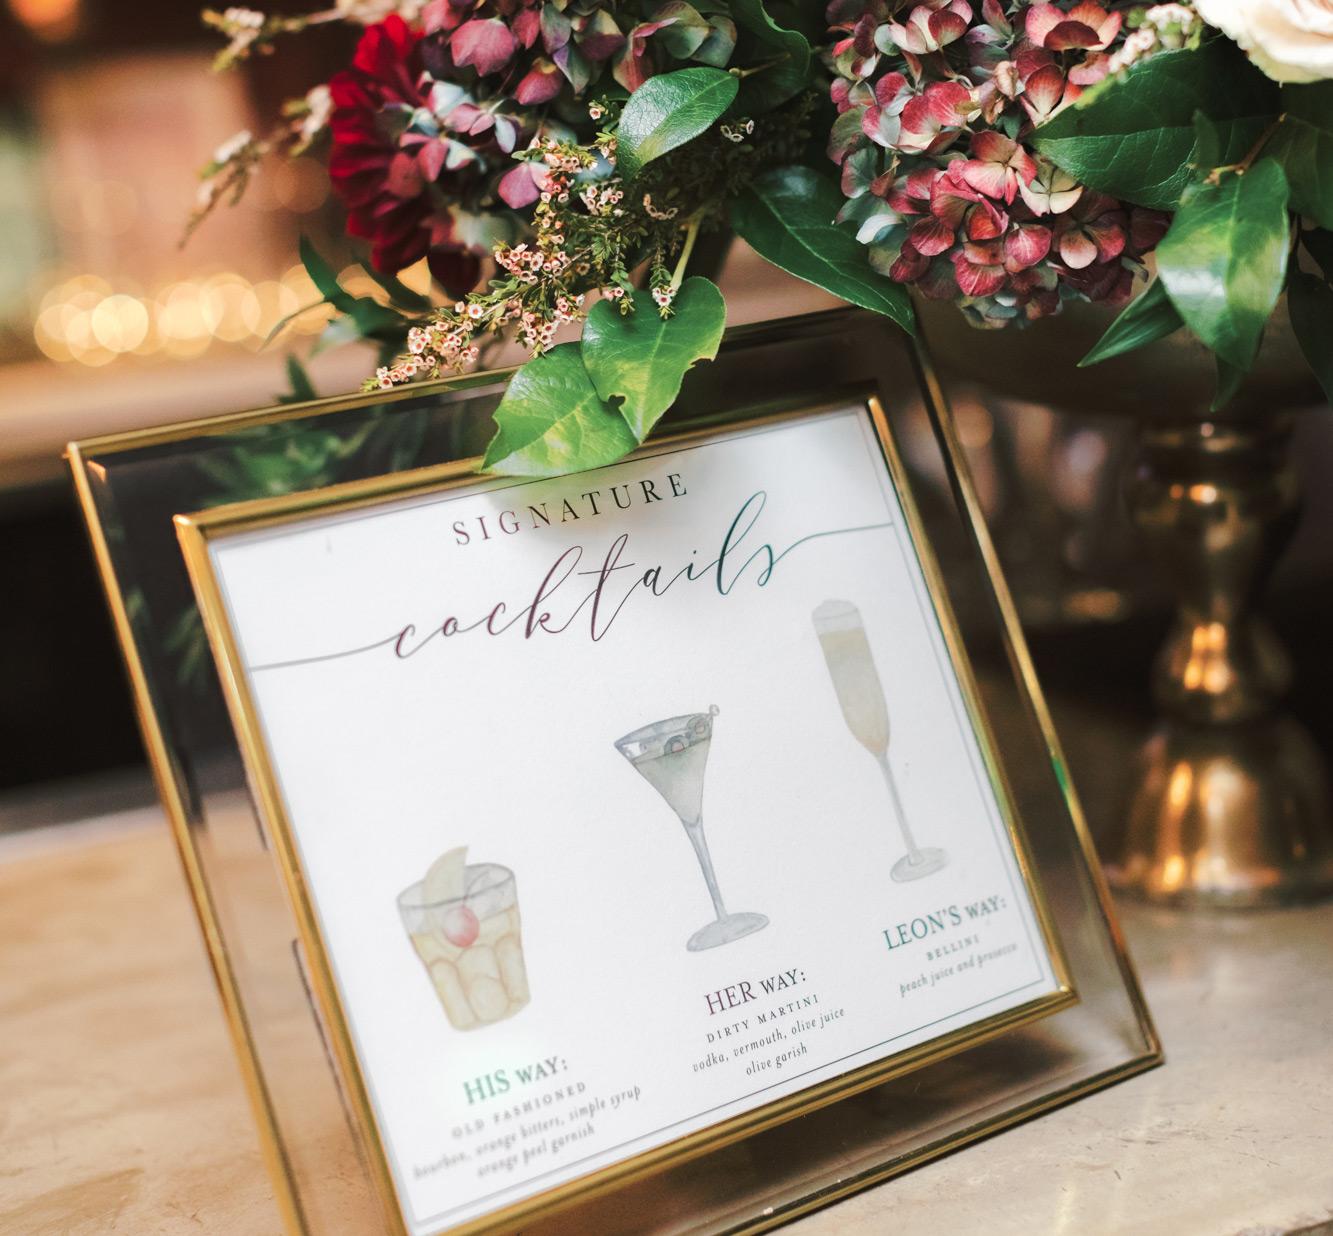 Wedding Signature Drinks.Cute Signature Cocktail Names Whimsique Invitations